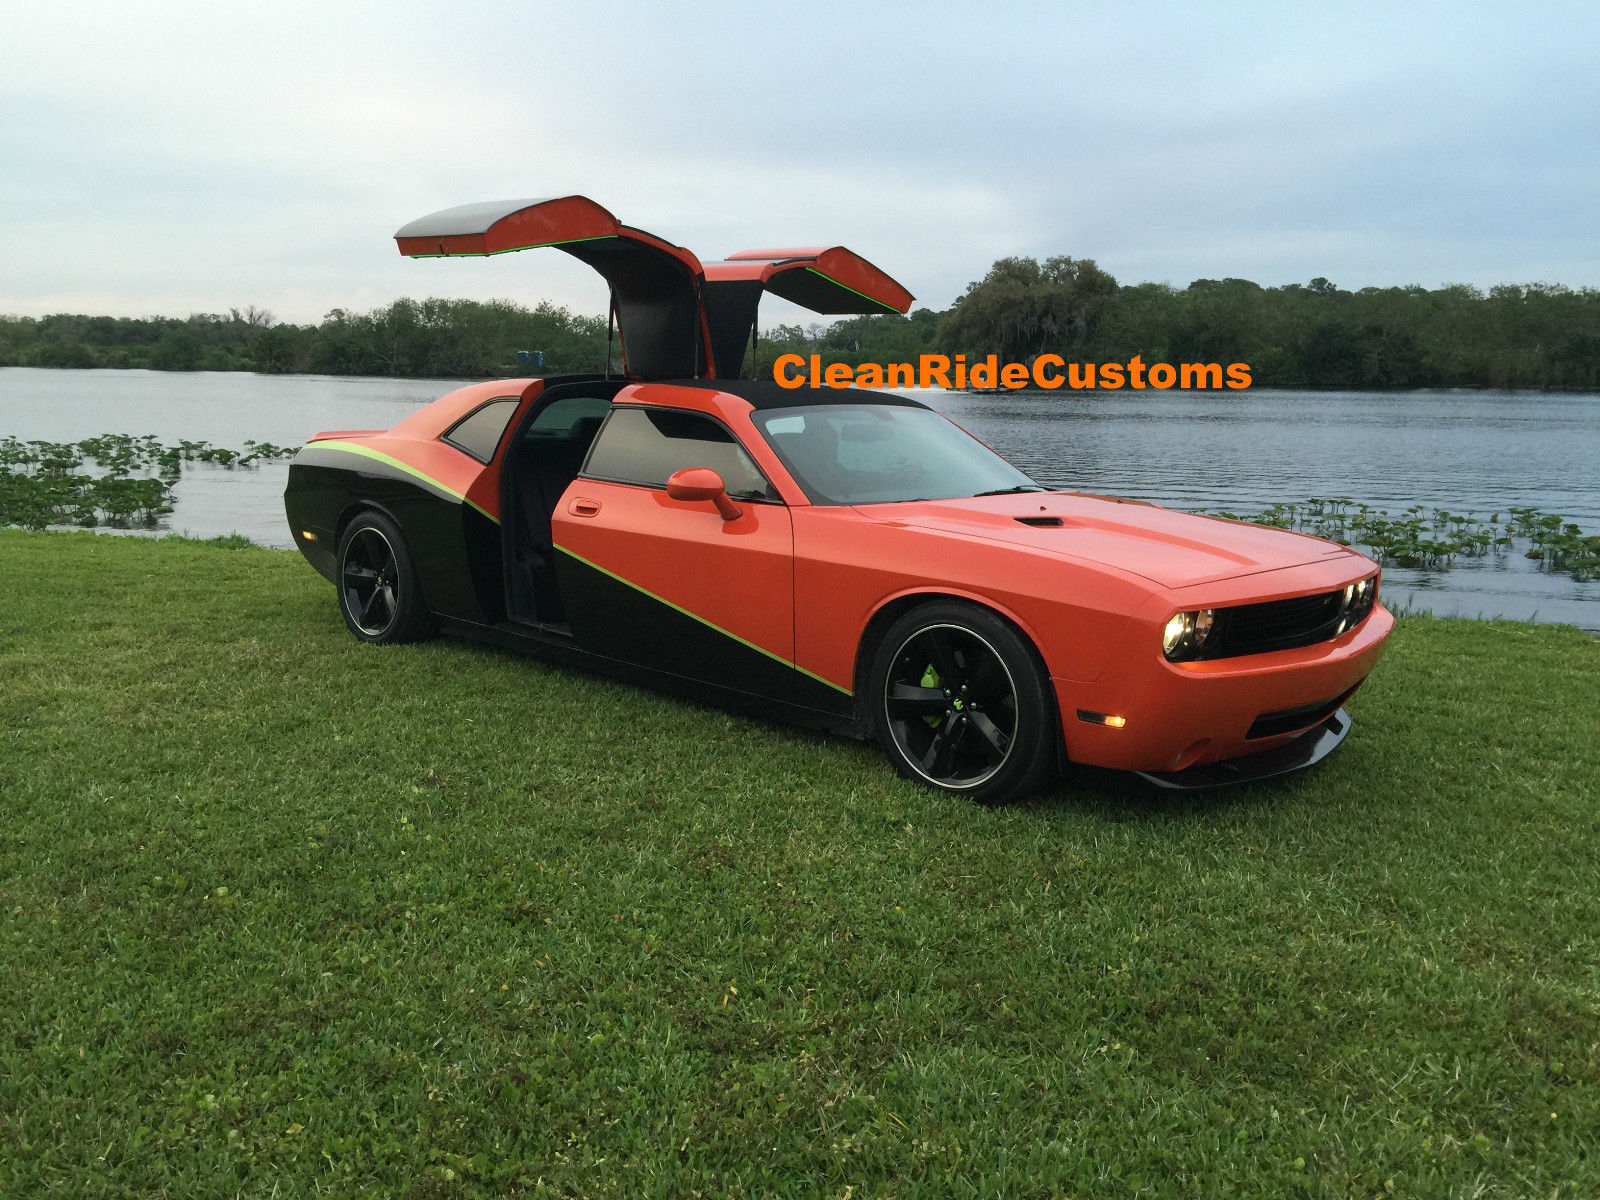 Charger Srt8 For Sale >> Four-Door Dodge Challenger SRT8 Has Rear Gullwing Doors ...